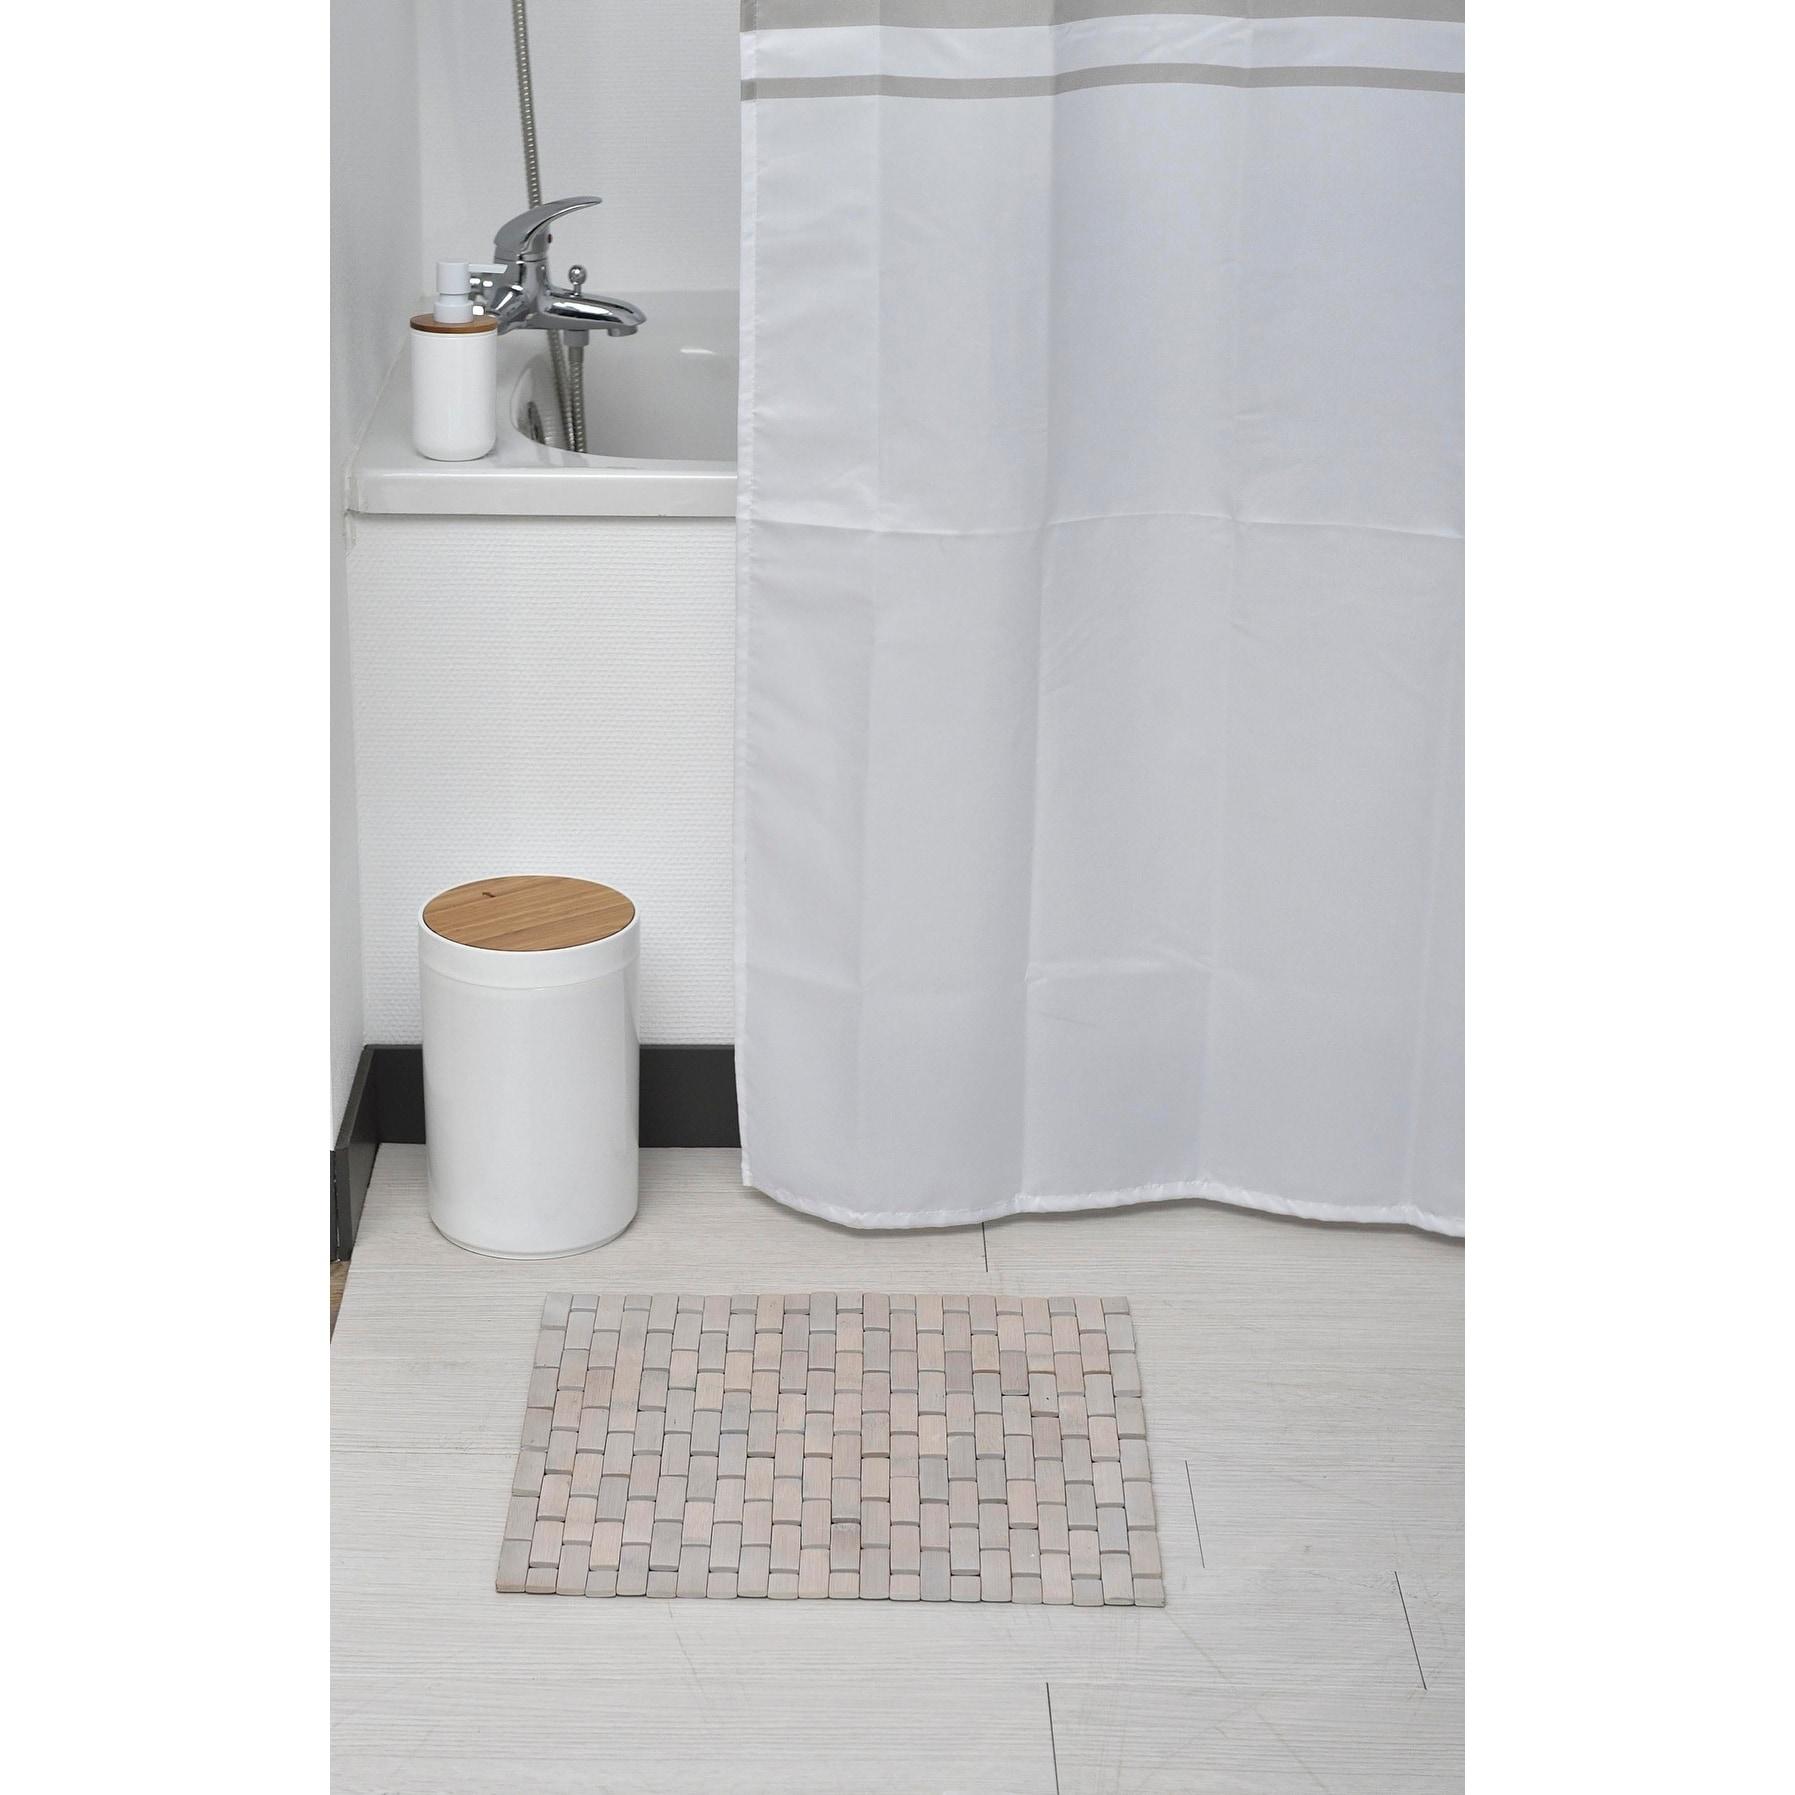 Evideco Bamboo Slats Roll Up Foldable Shower Door